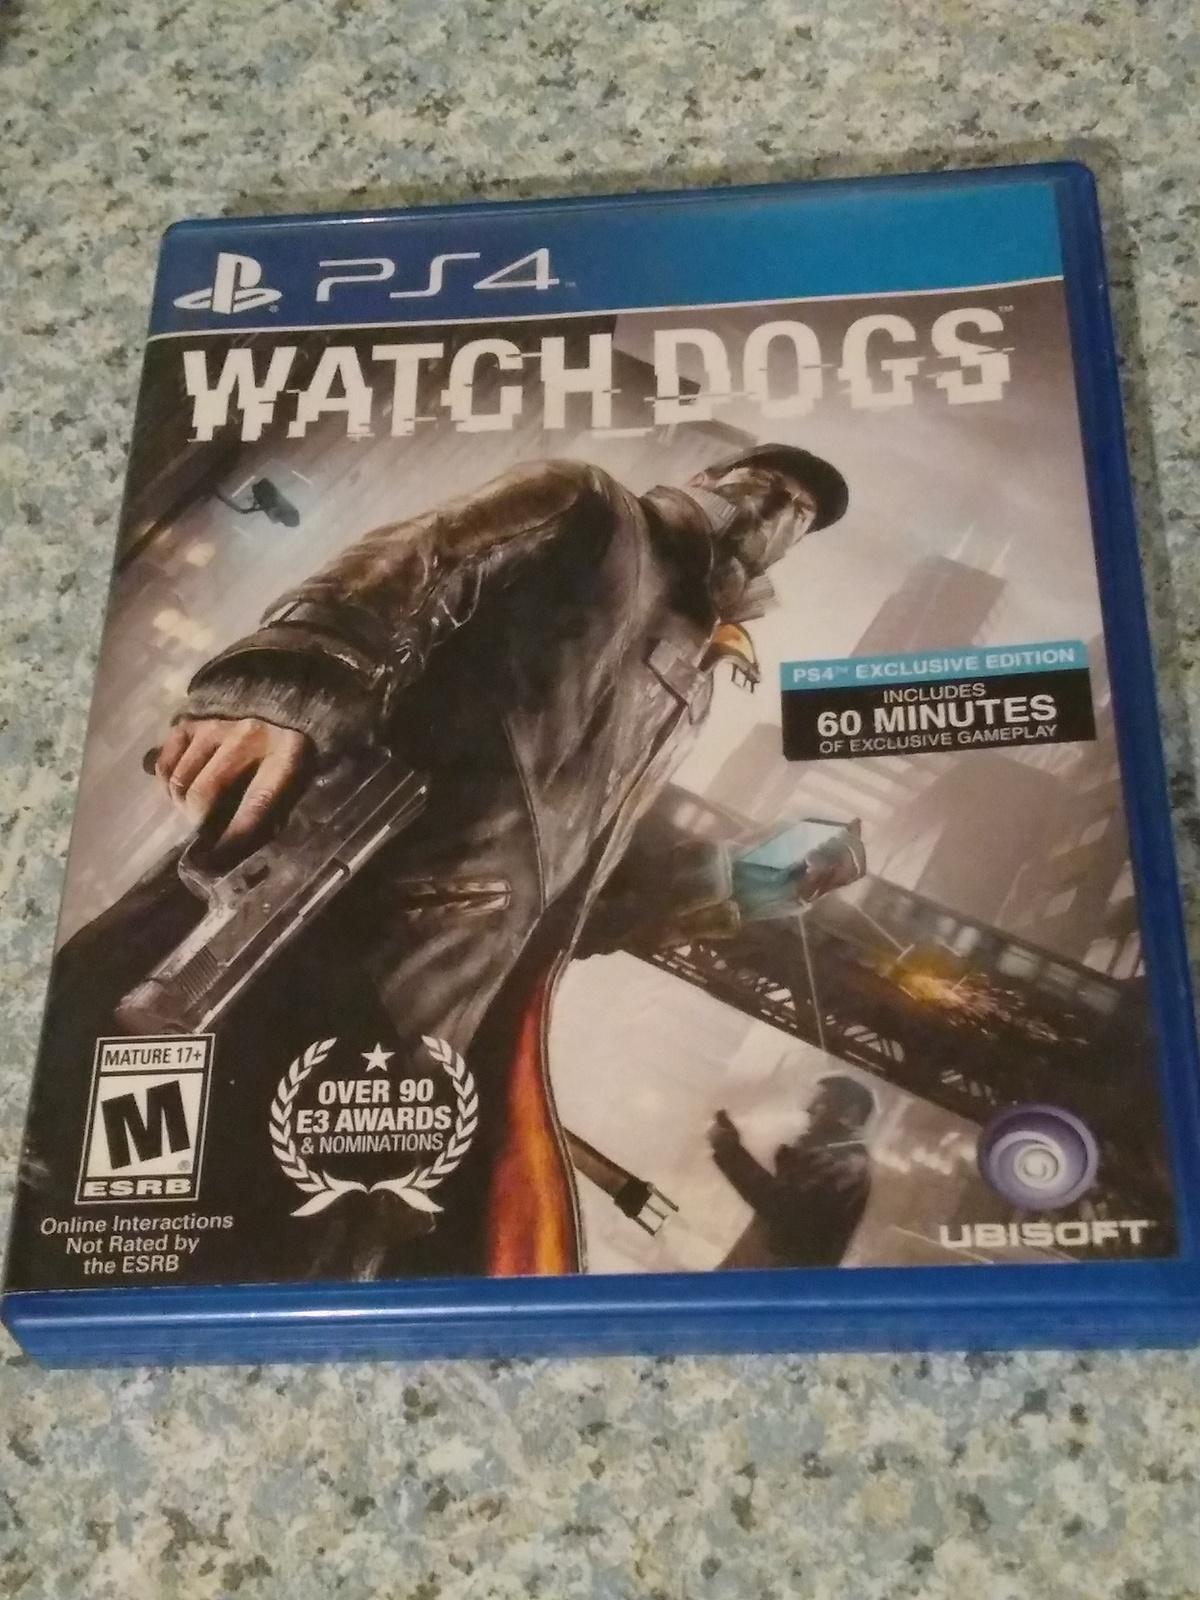 Watch Dogs Sony PlayStation 4